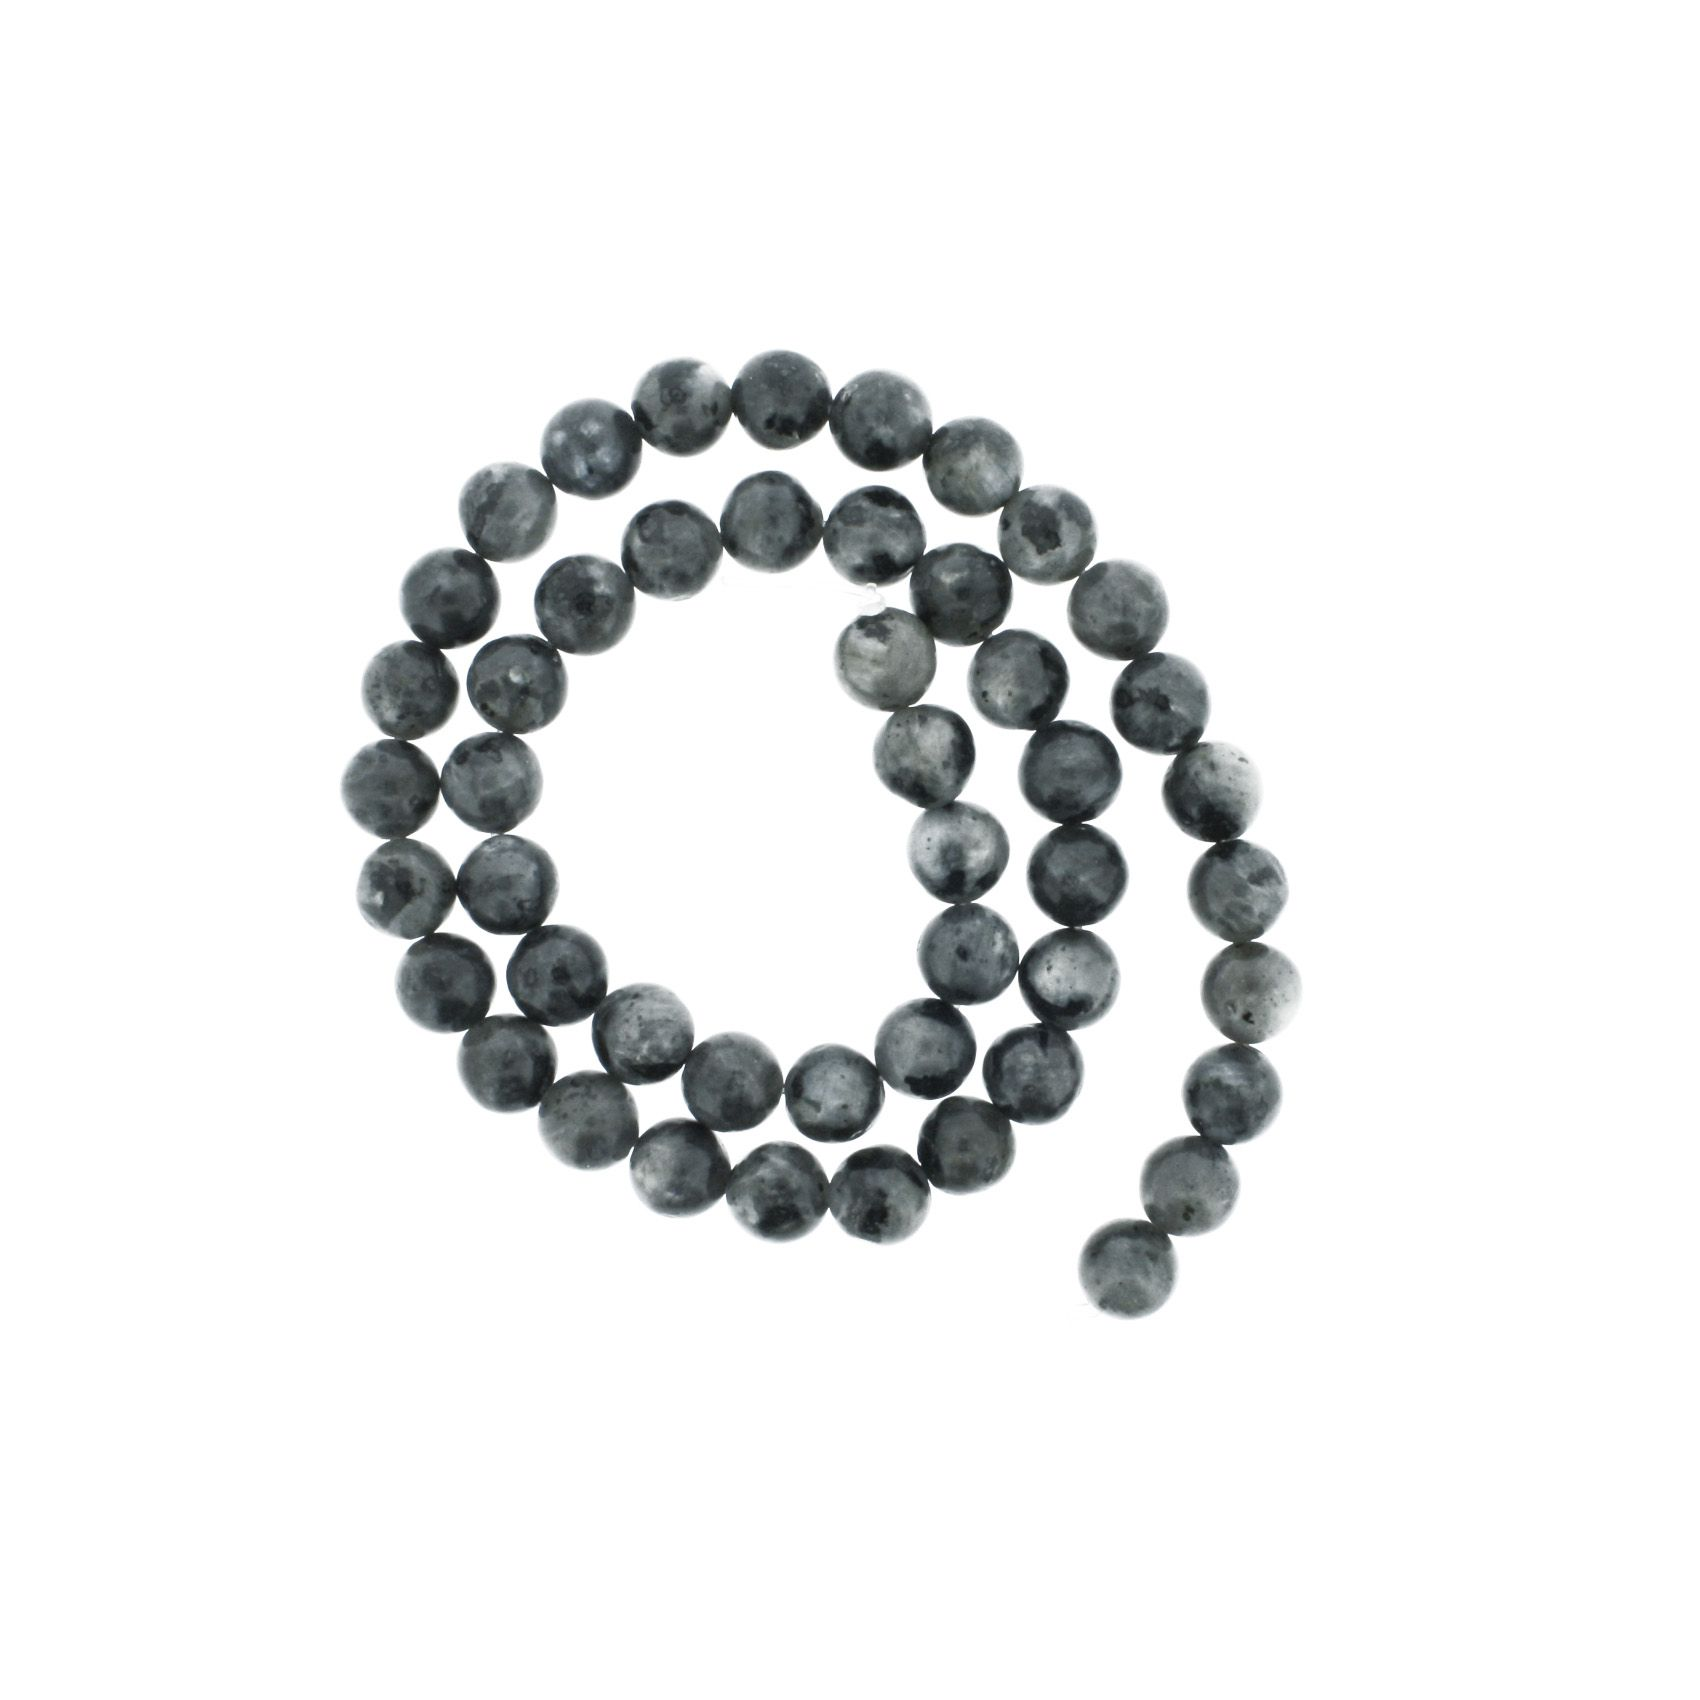 Fio de Pedra - Labradorita - 8mm  - Stéphanie Bijoux® - Peças para Bijuterias e Artesanato